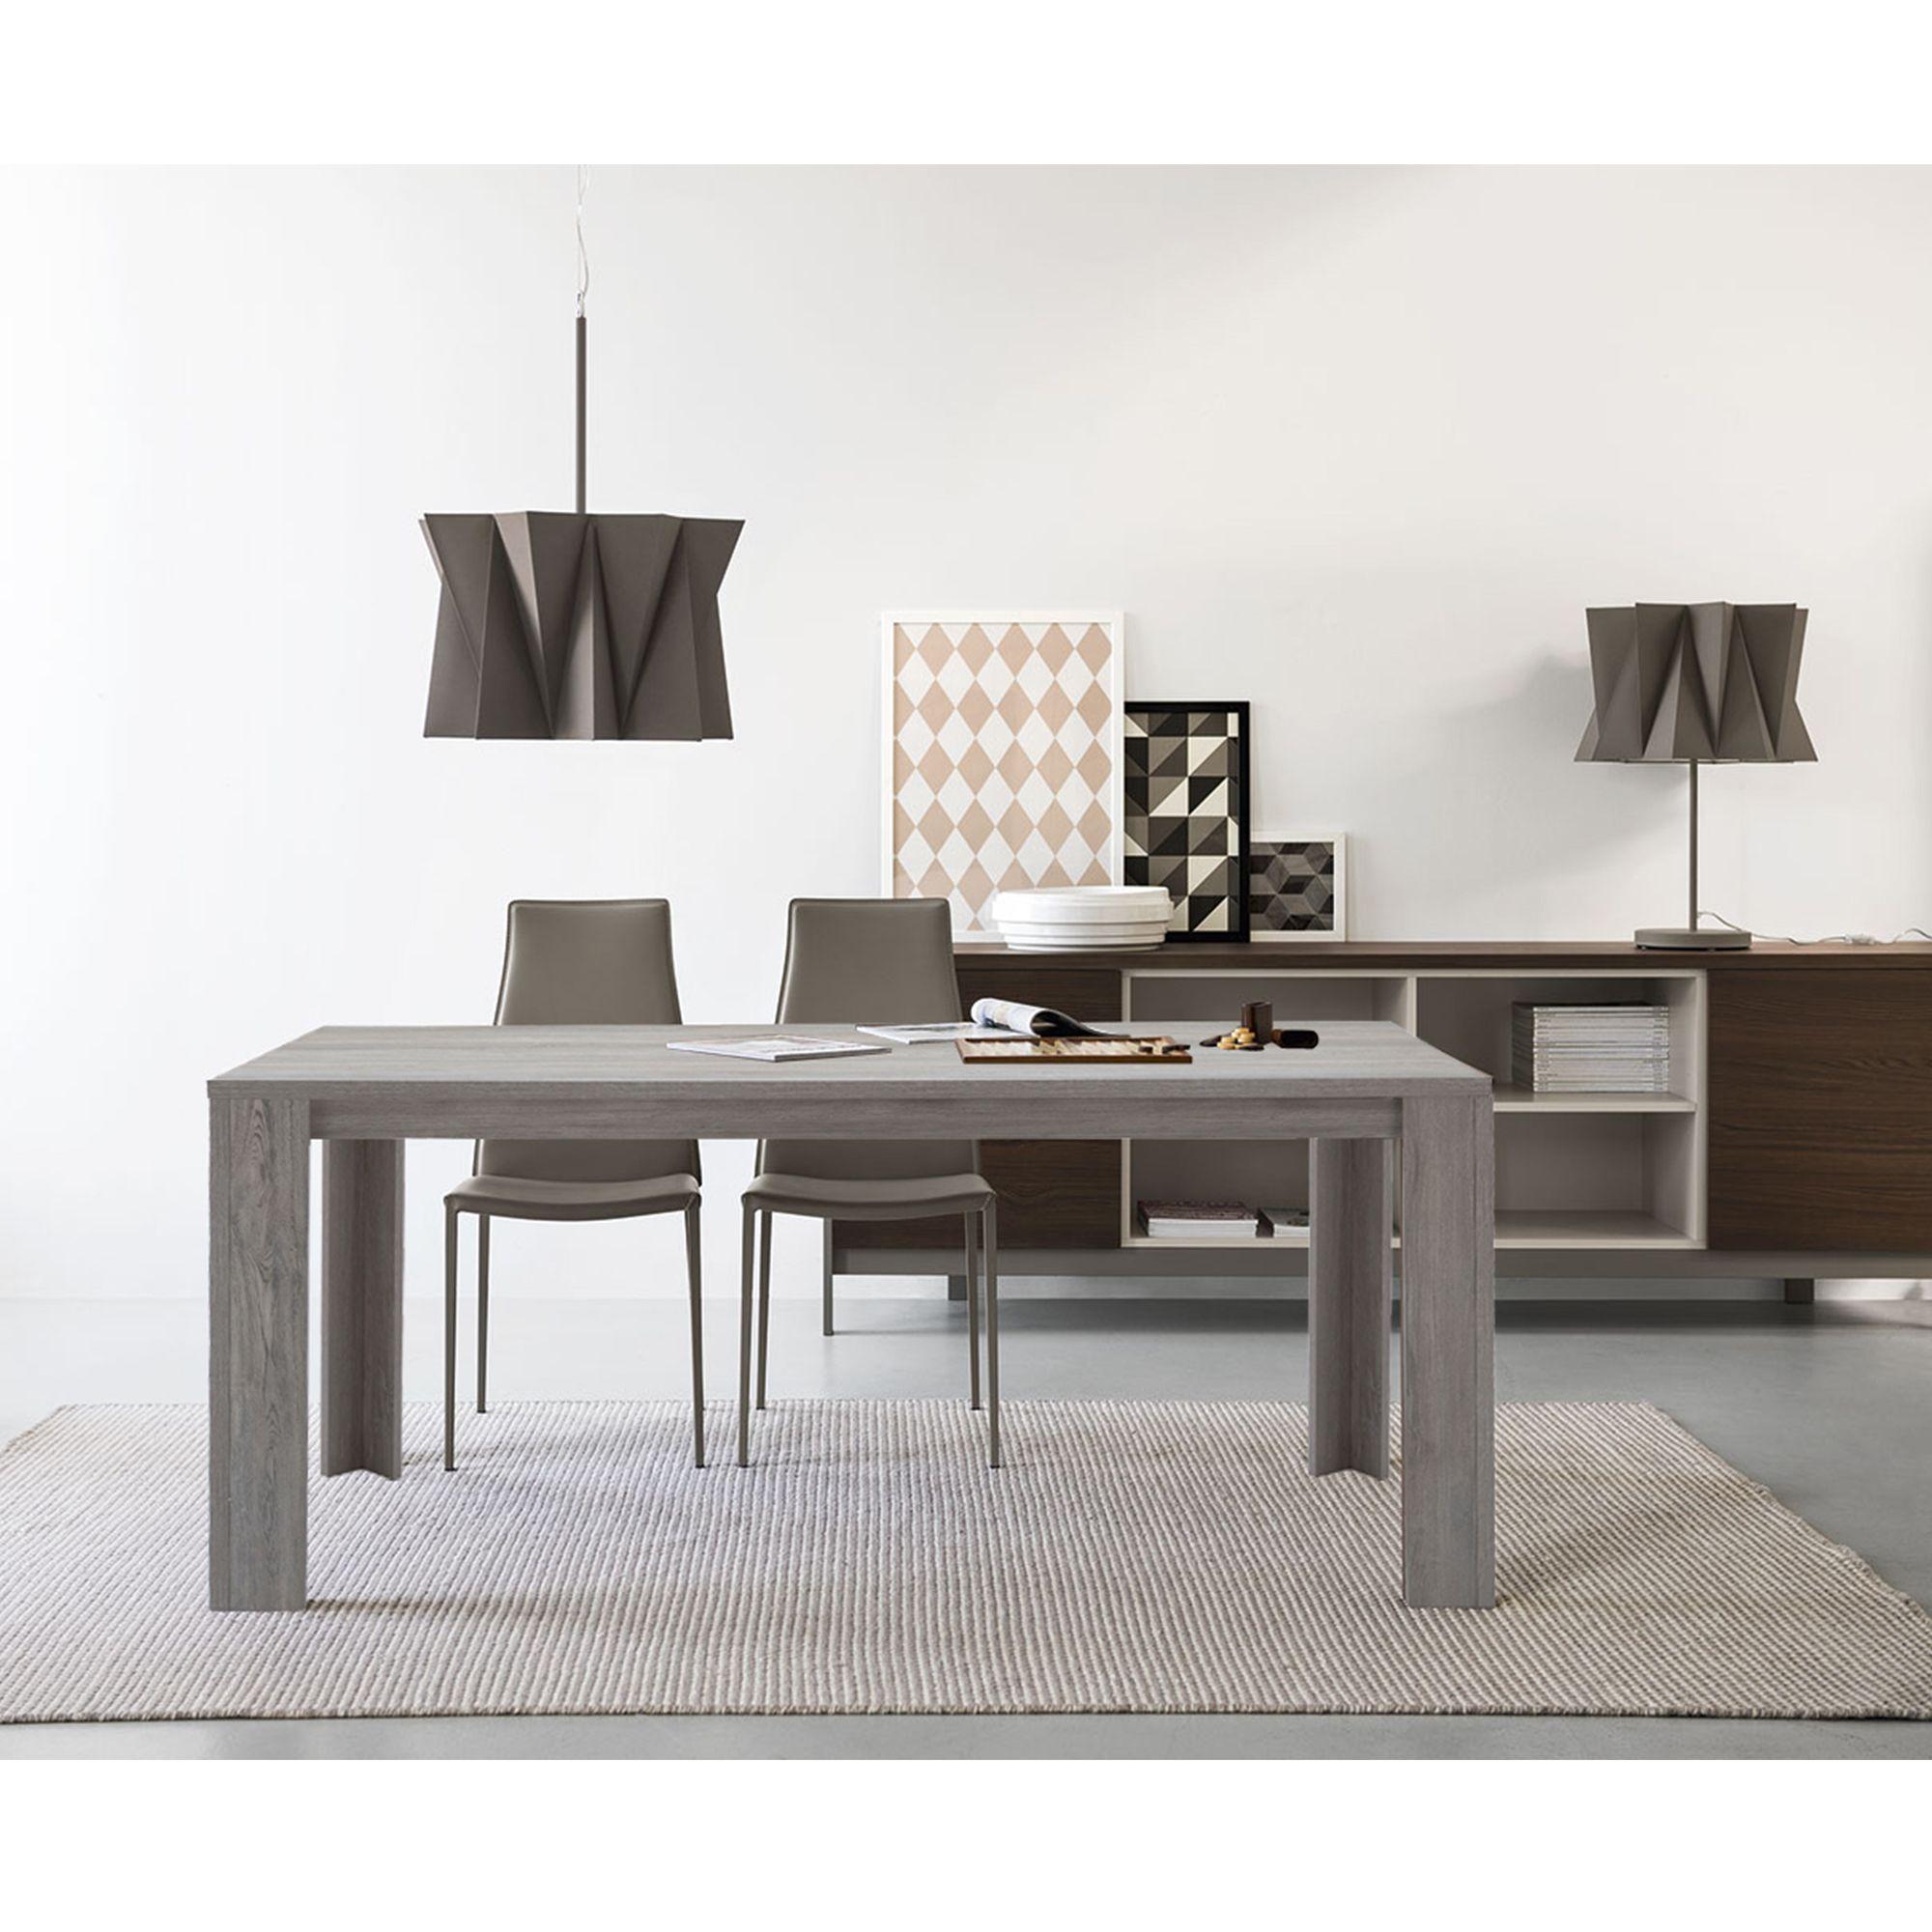 #diningtable #kitchentable #diningroomtable #kitchenidea #hometable #rectangular #designtable #restauranttable #ebaytable #ebayfurniture